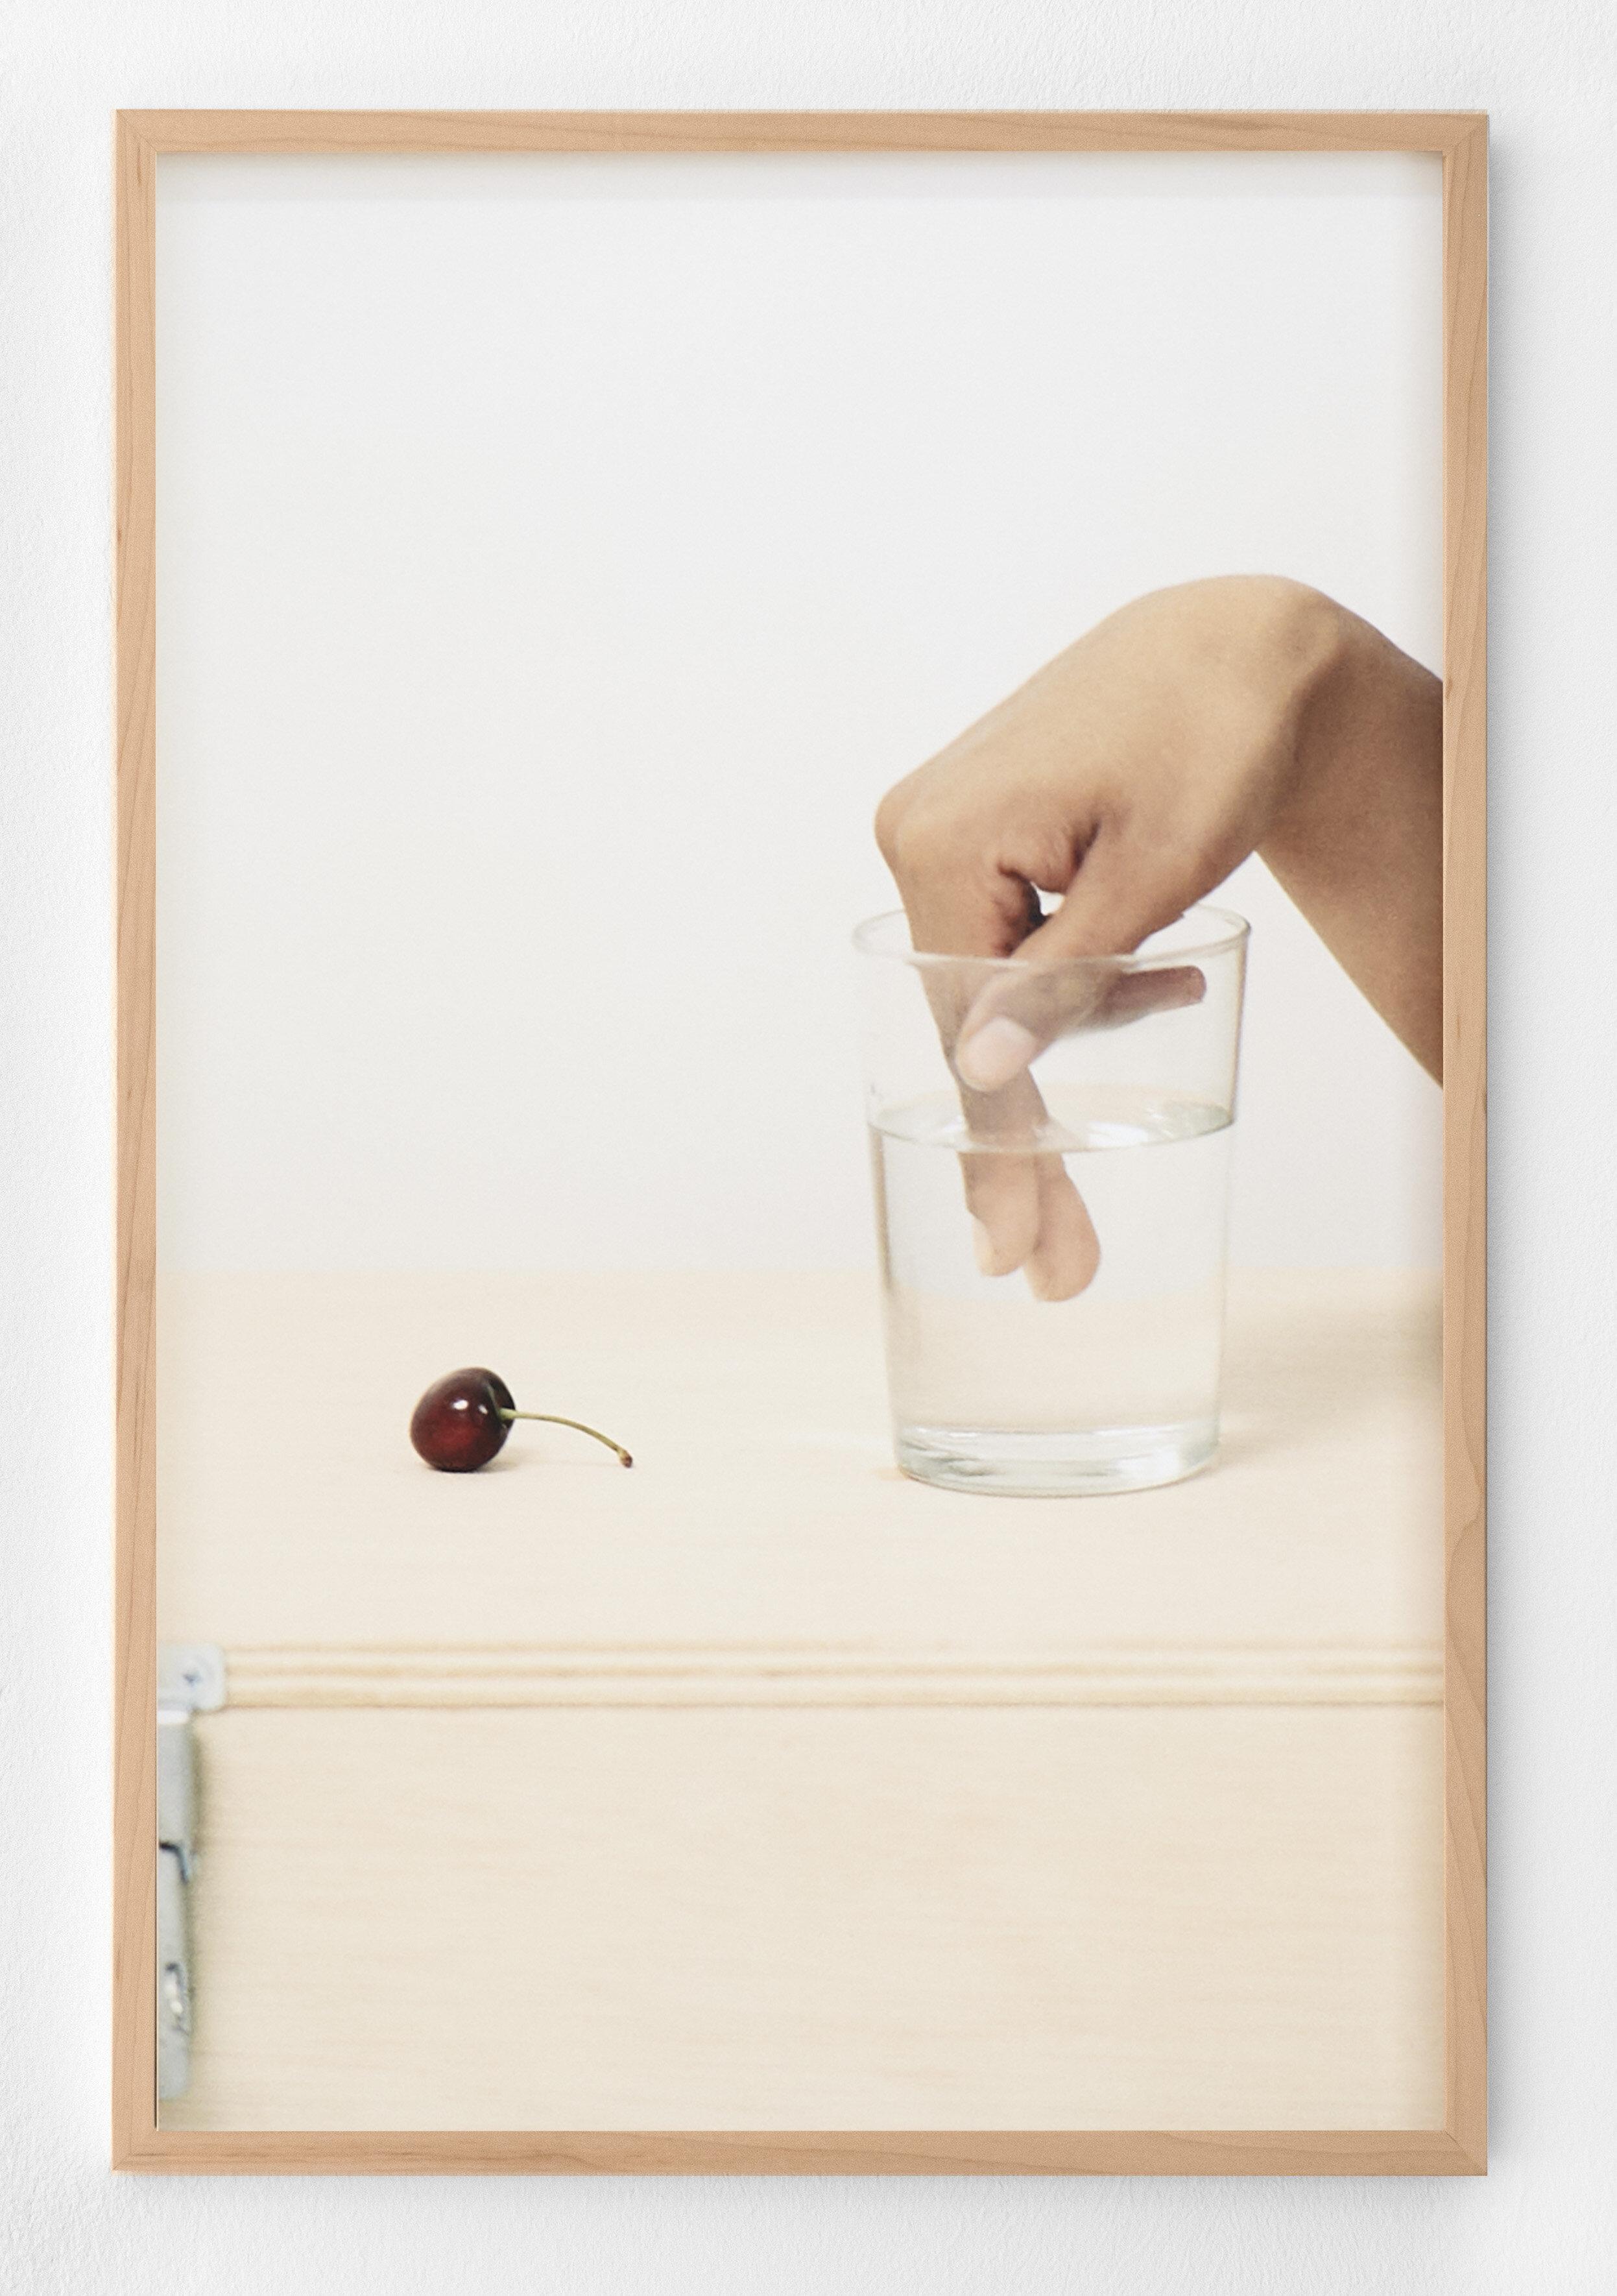 Cherries 2 , 2019, Archival pigment print, 12 x 18.25 inches